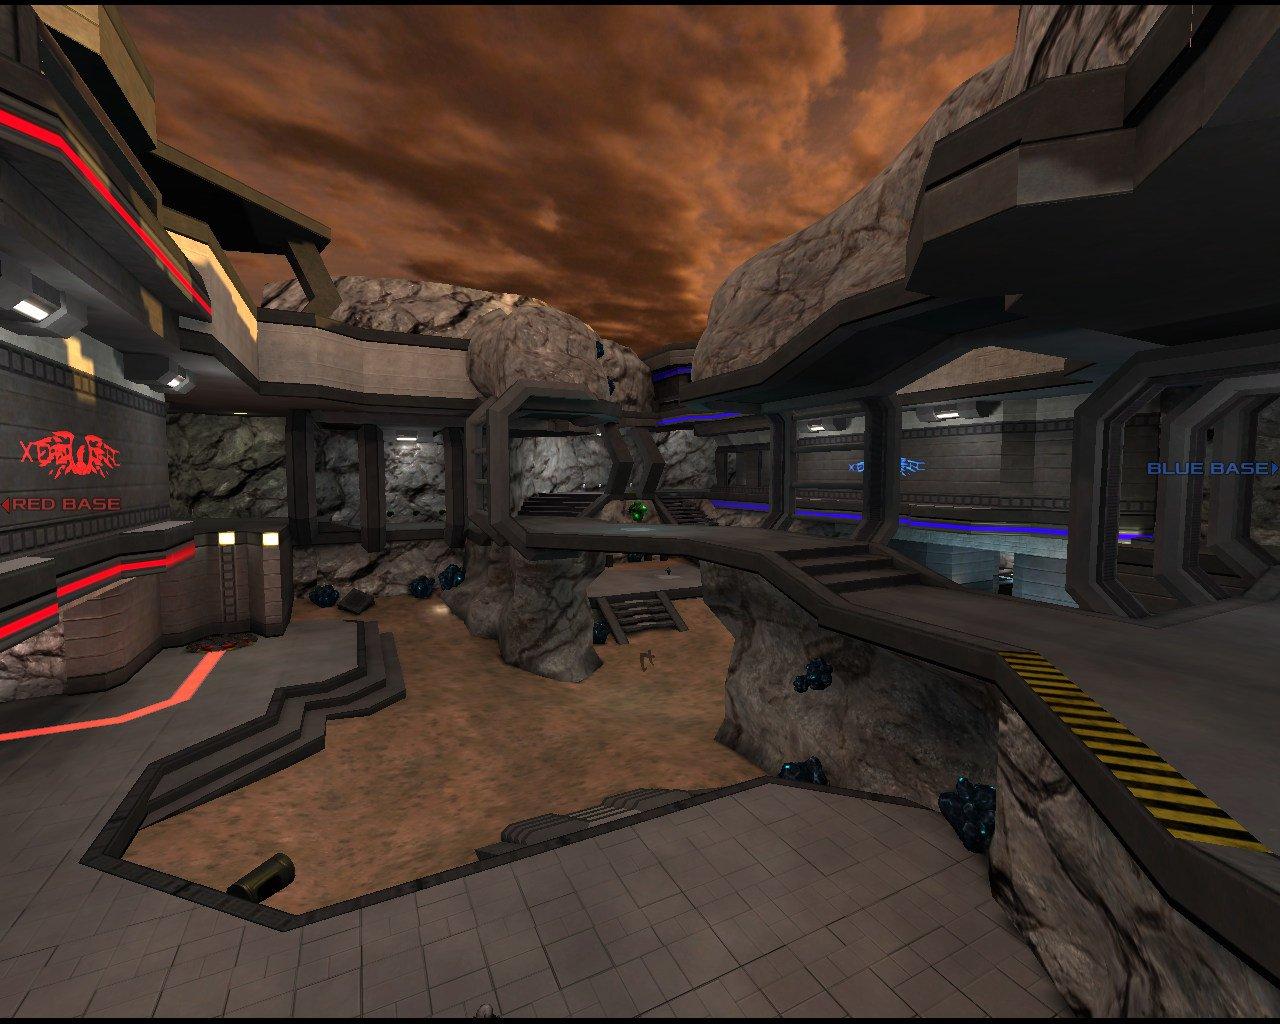 3D Gun Games No Download xonotic: the free and fast arena shooter - xonotic